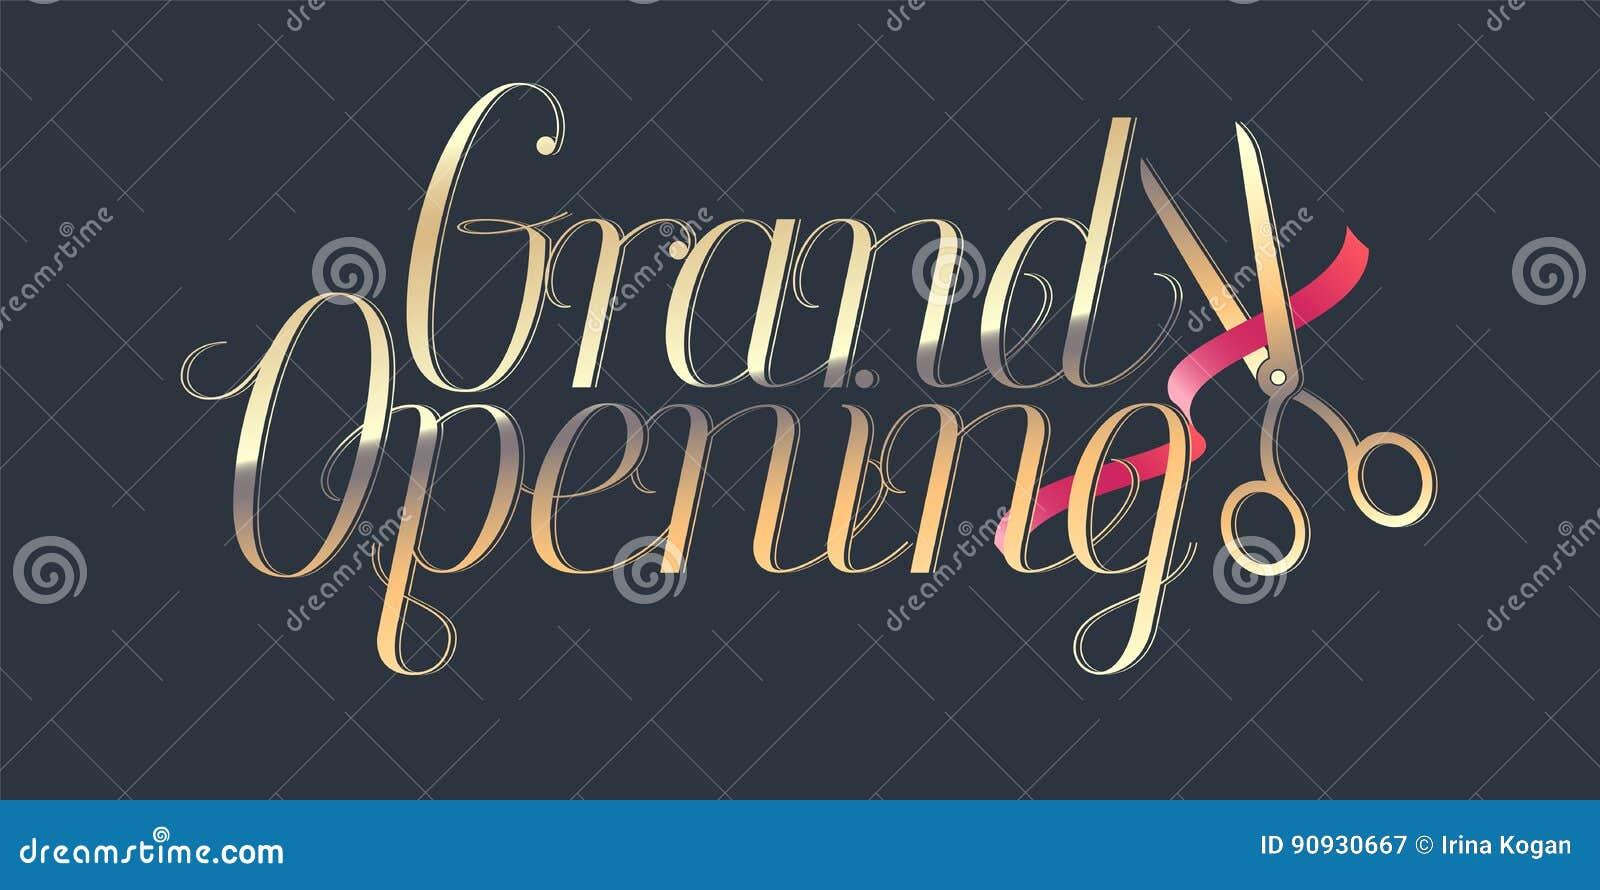 Grand Opening Vector Illustration Stock Vector - Illustration of ...